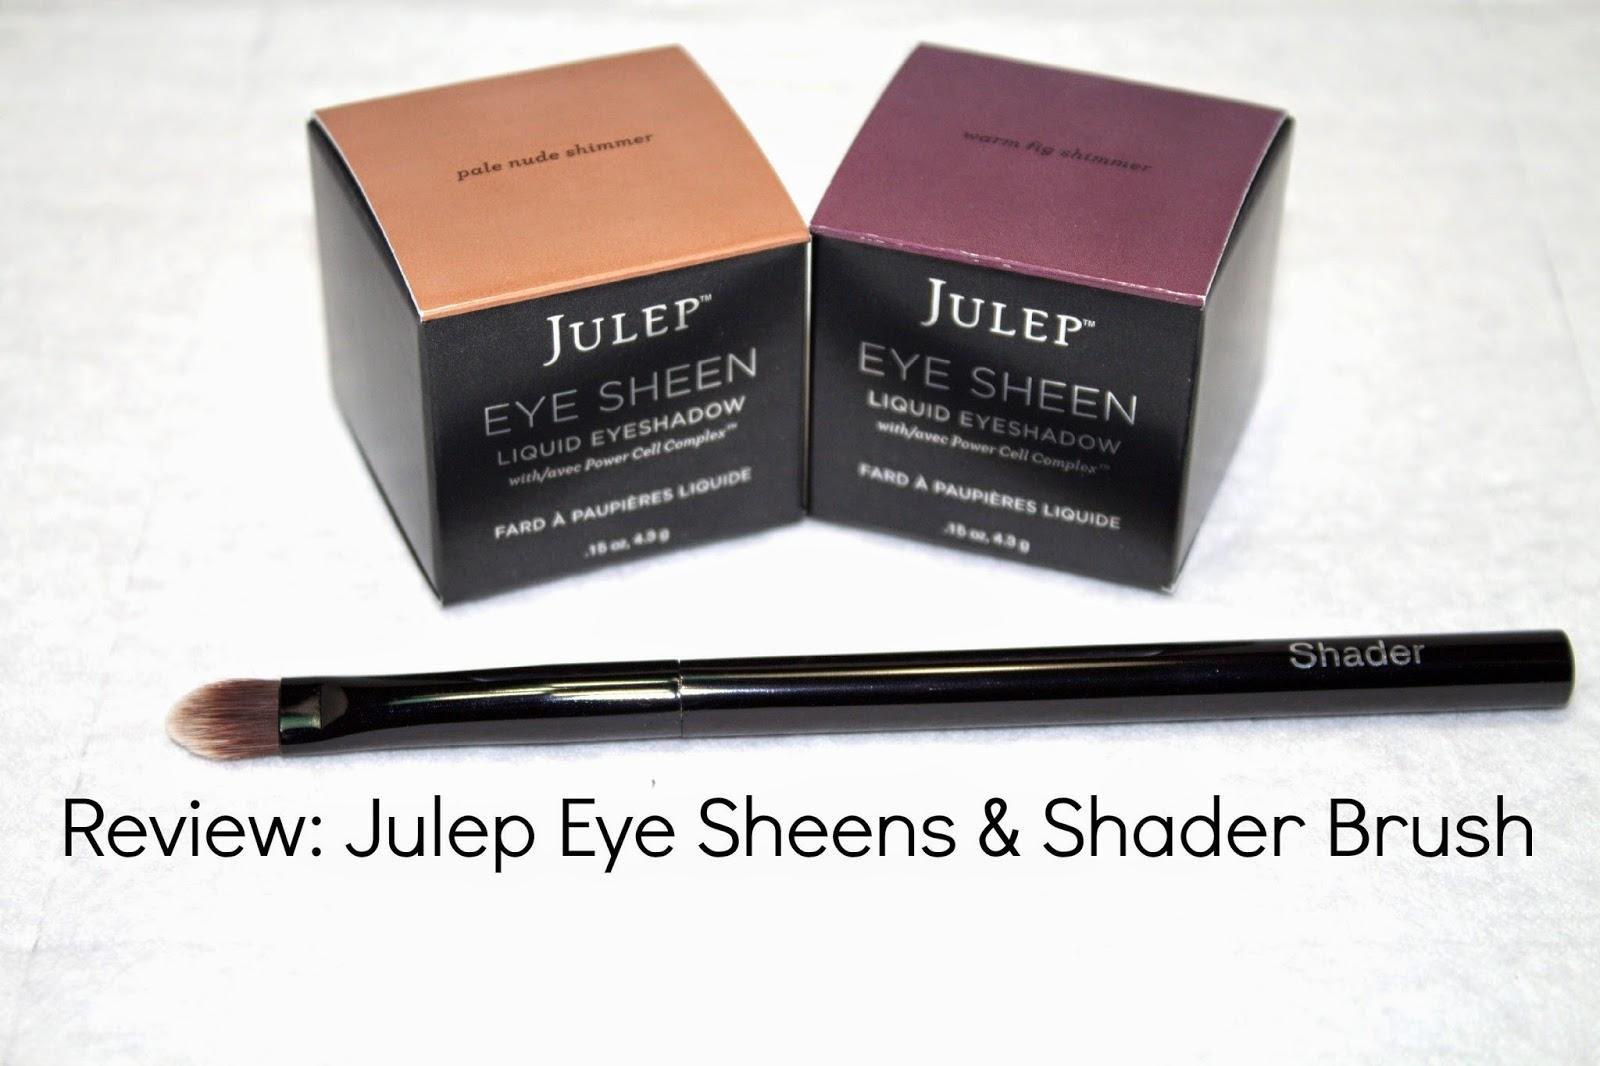 Julep Eye Sheen, Julep Shader Brush, Review, @girlythingsby_e